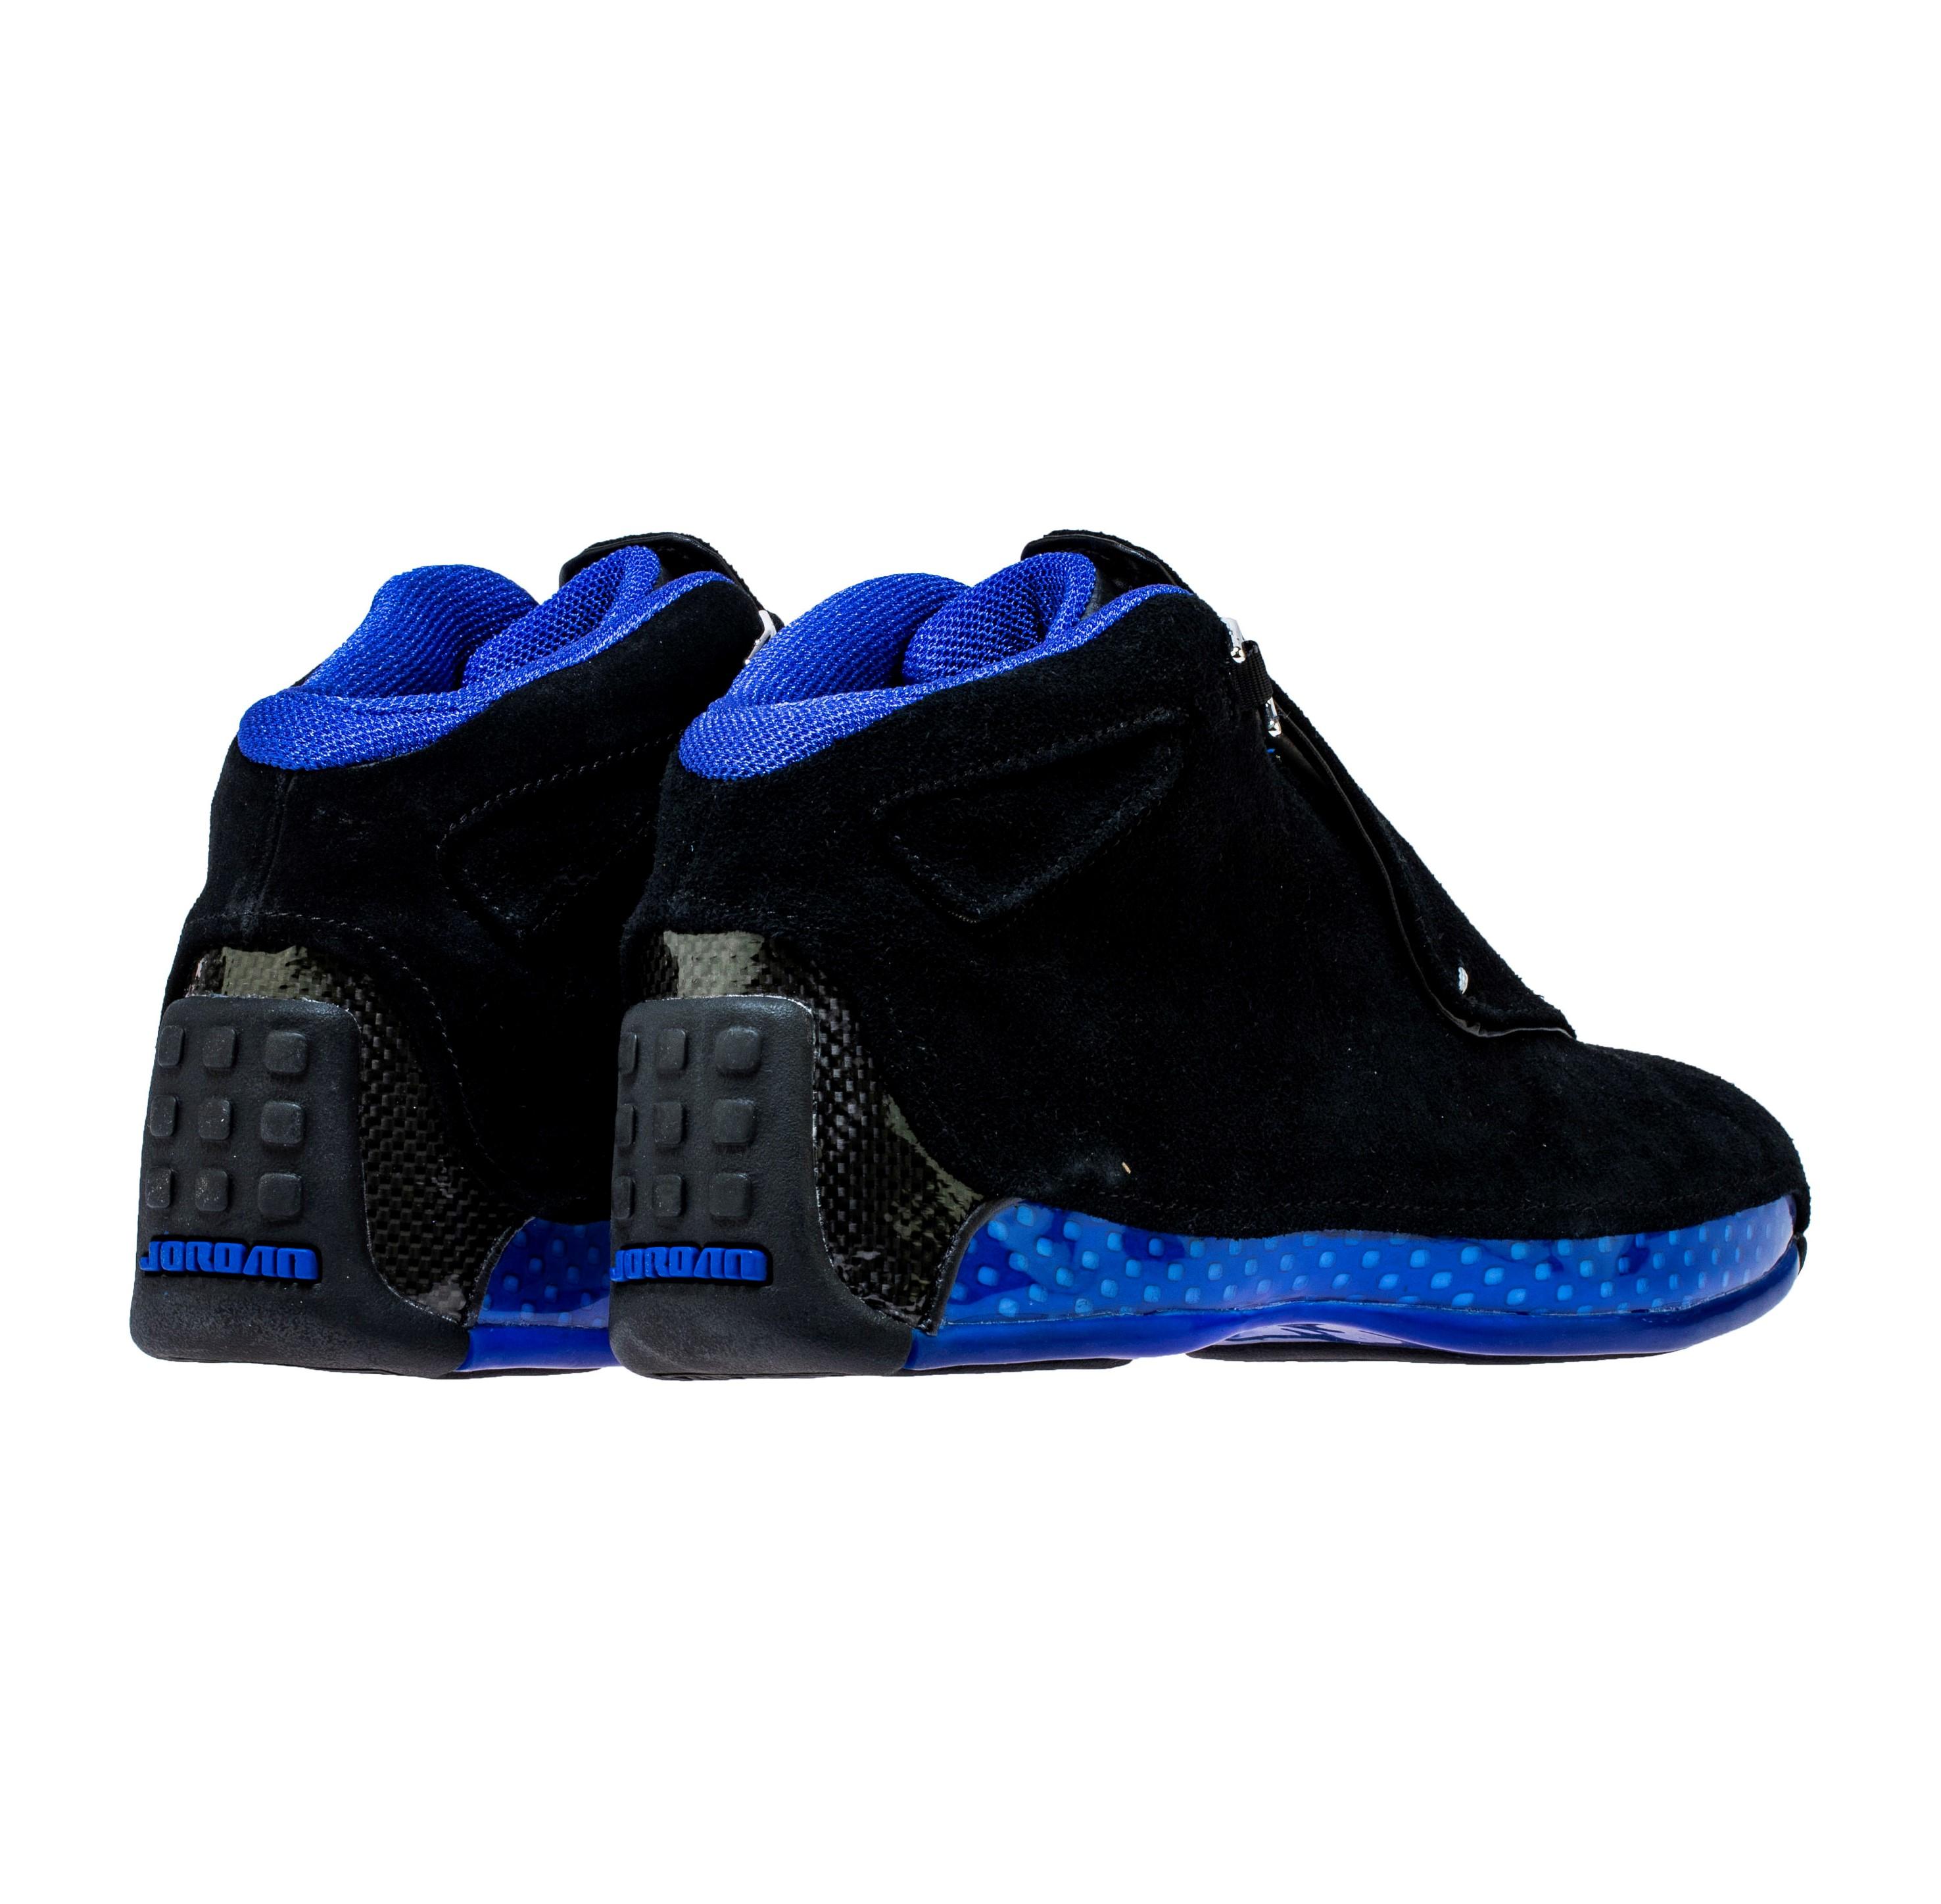 2e18a7e044a28e air jordan 18 black sport royal release date - WearTesters